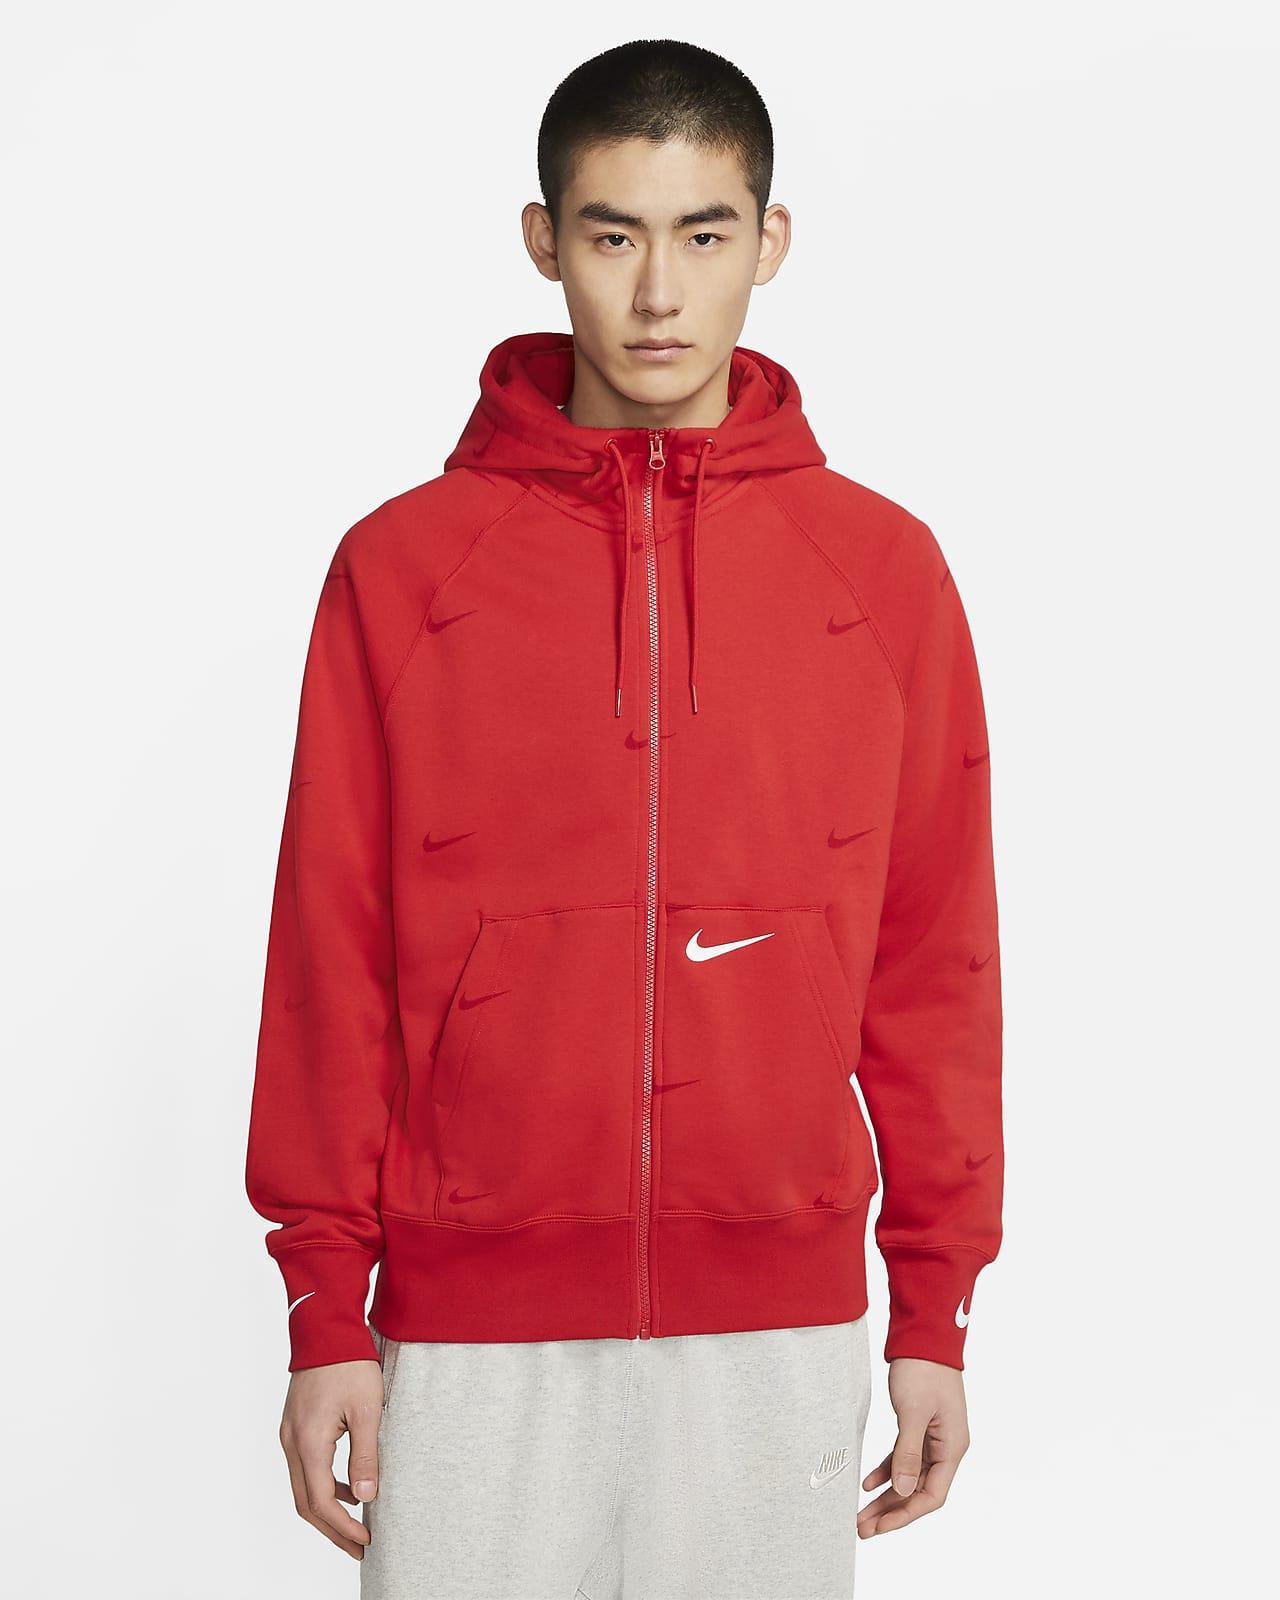 Nike Sportswear Swoosh 男子连帽衫